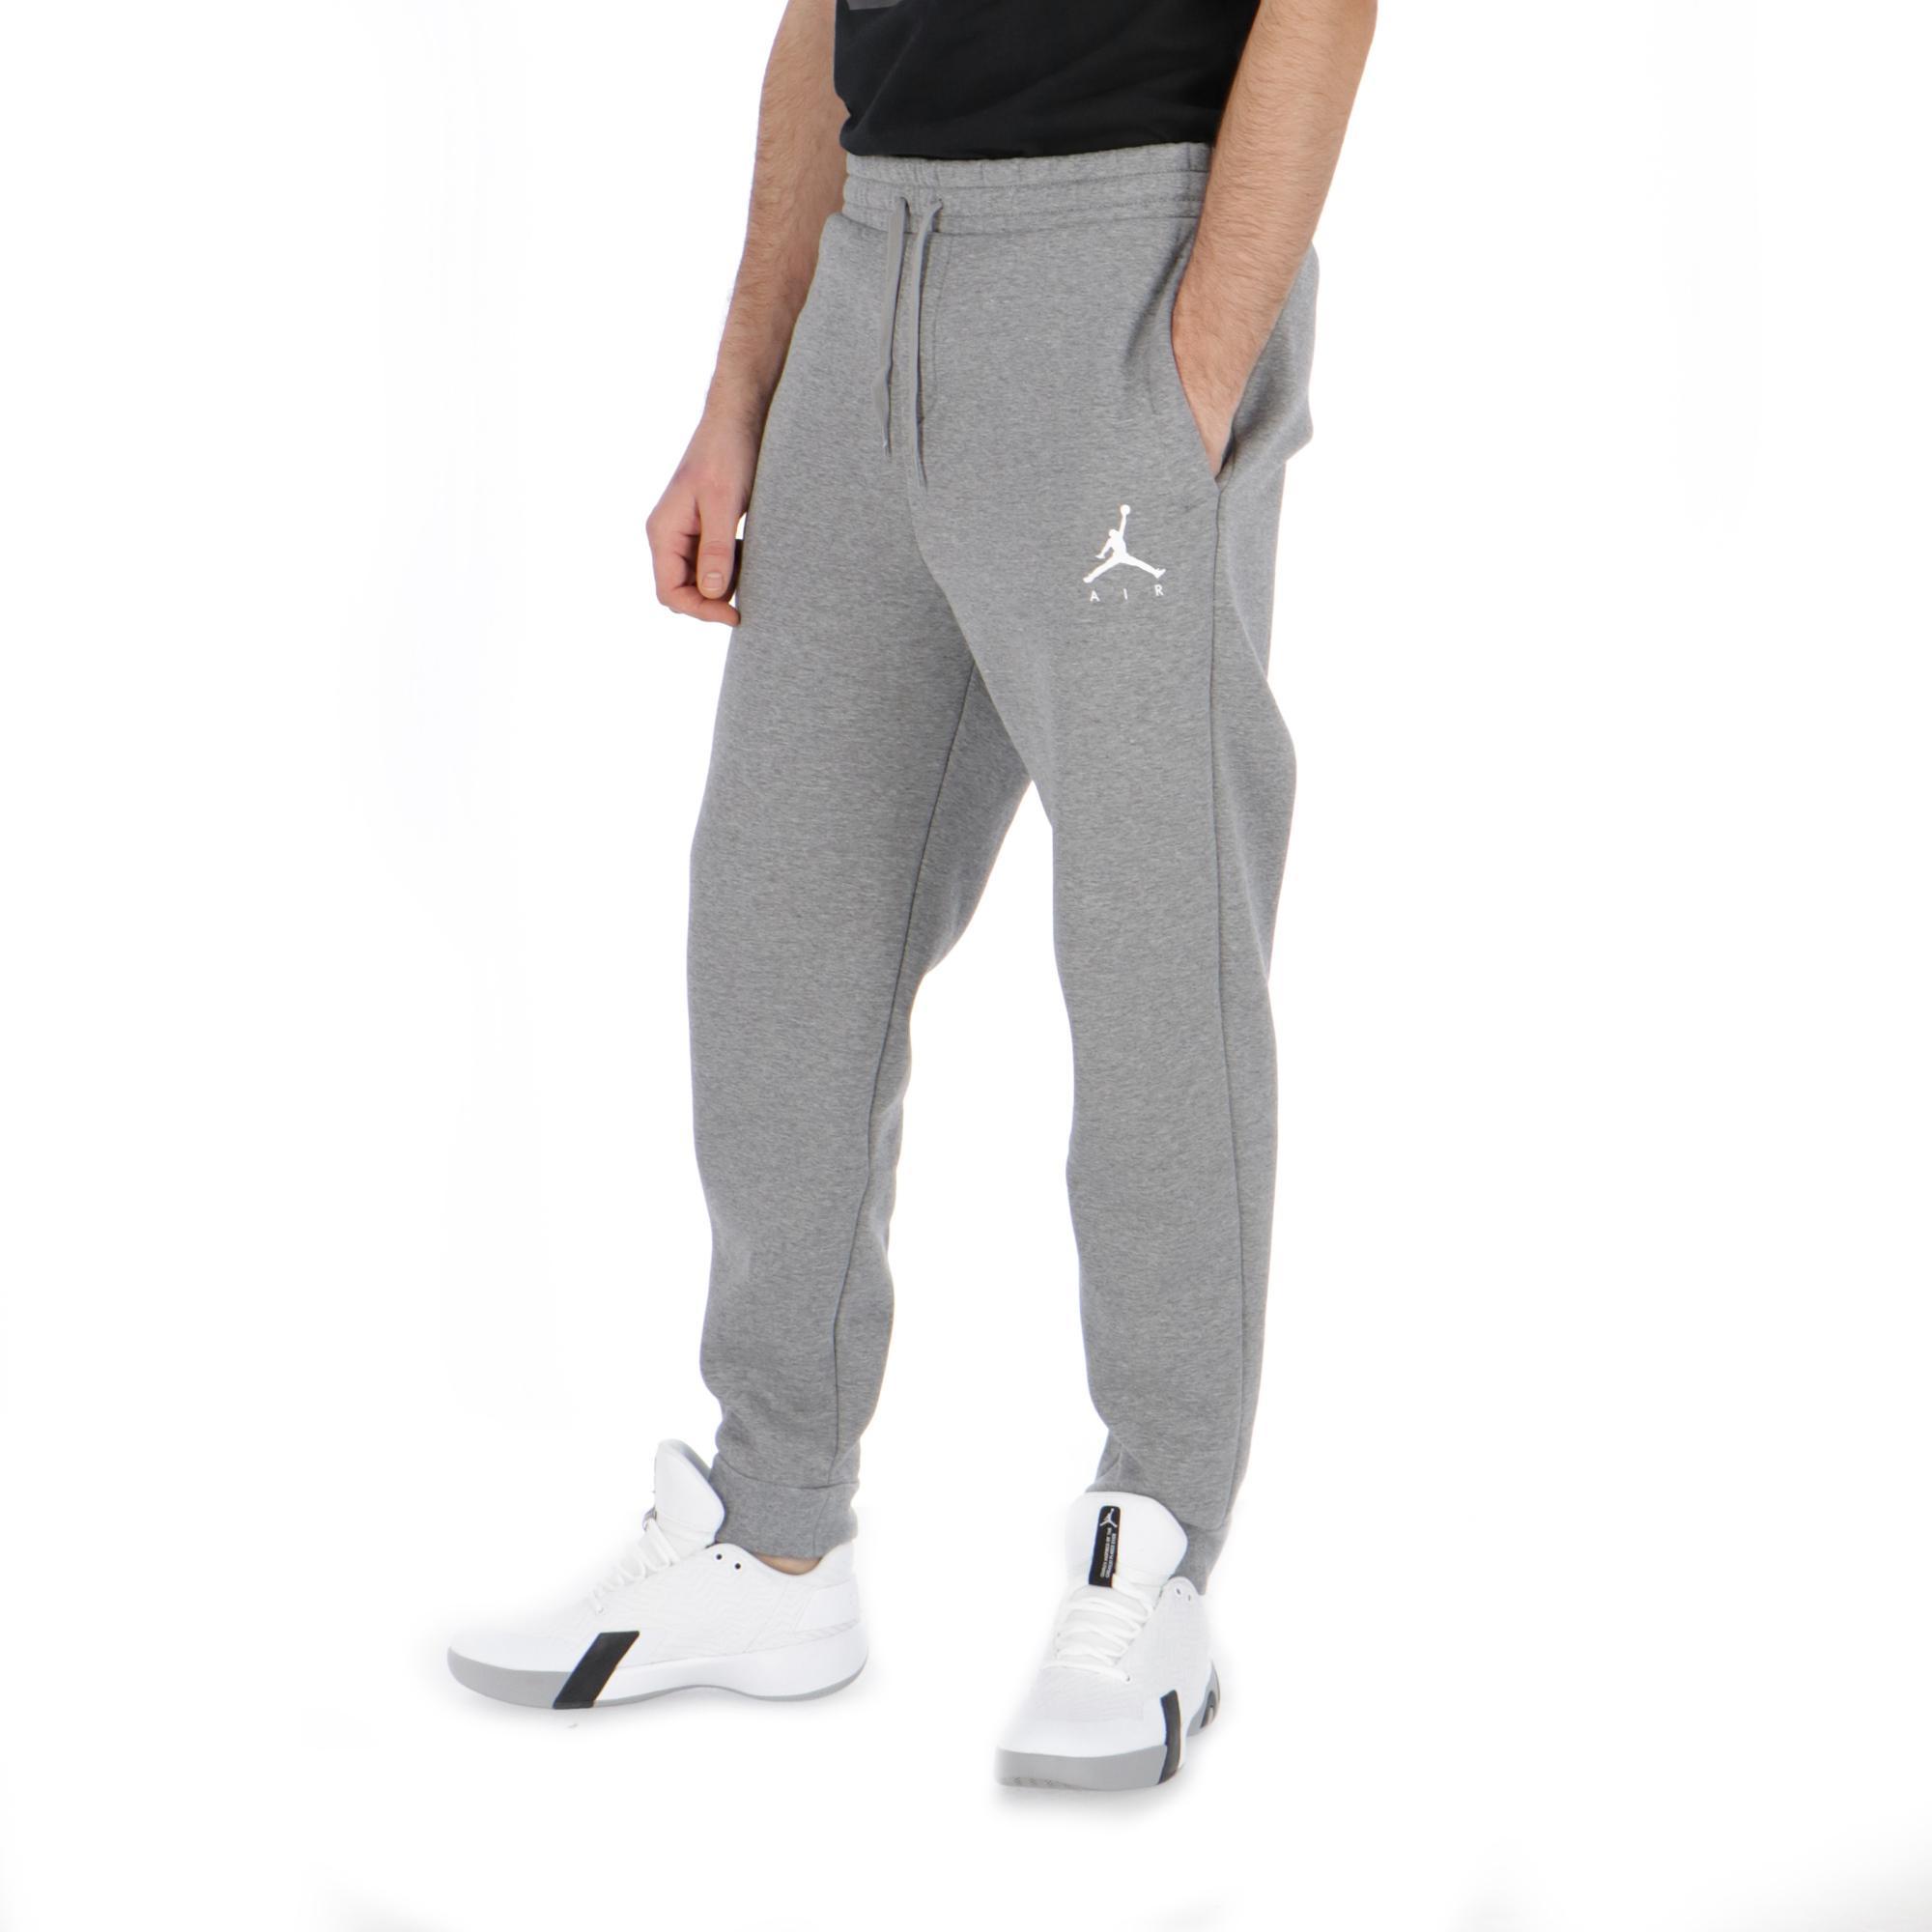 5c9be7aa9c05 Jordan Jumpman Fleece Pant Carbon Heather white